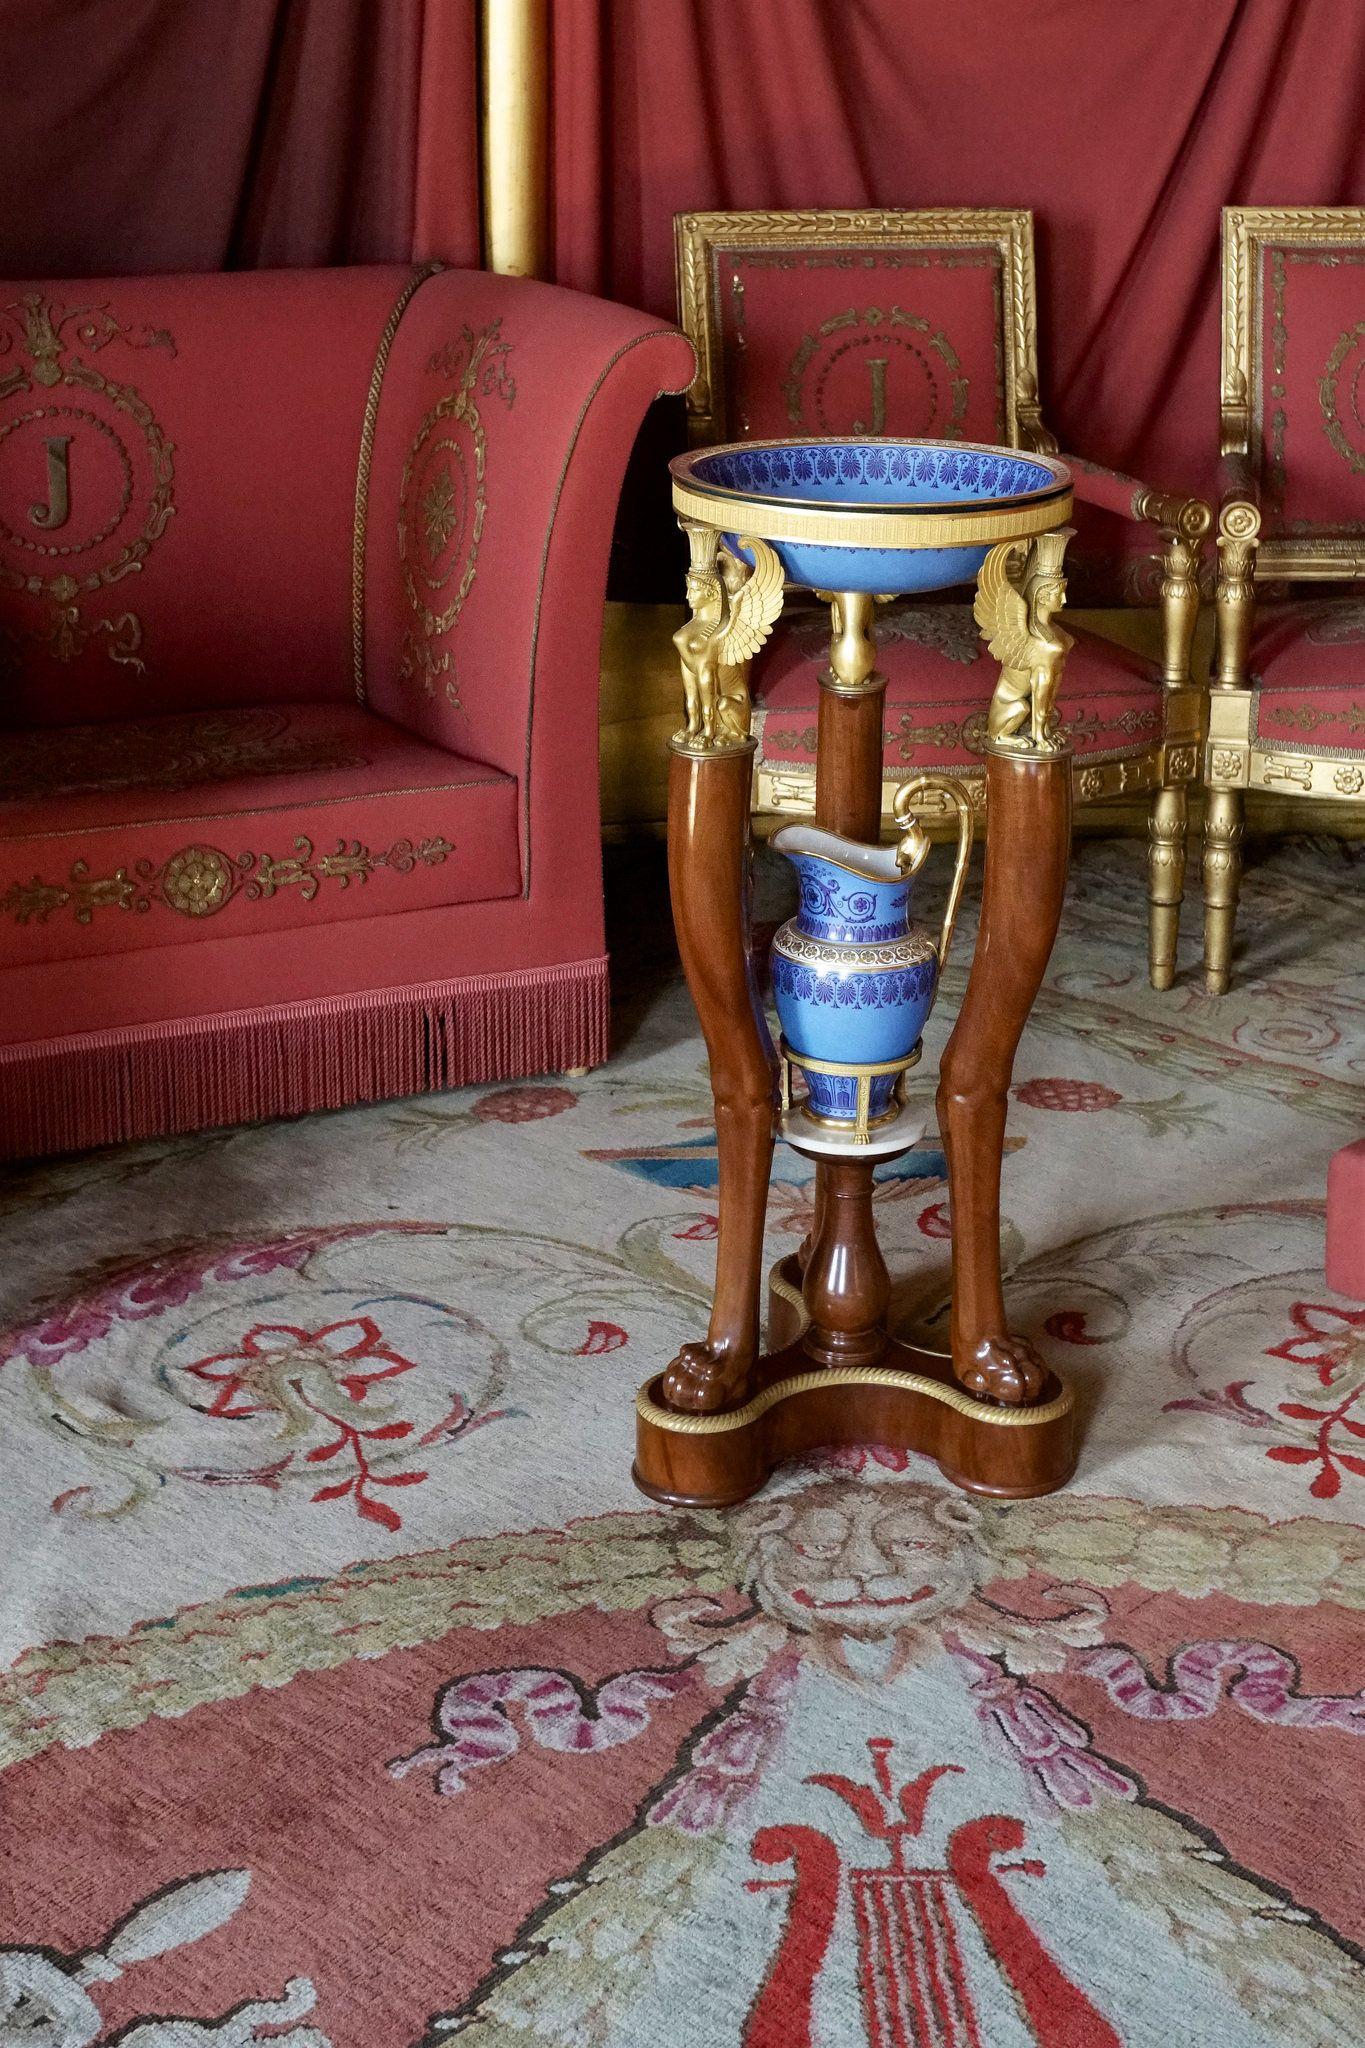 Josephine S Washbasin Chateau Malmaison Malmaison Century Furniture Chateau